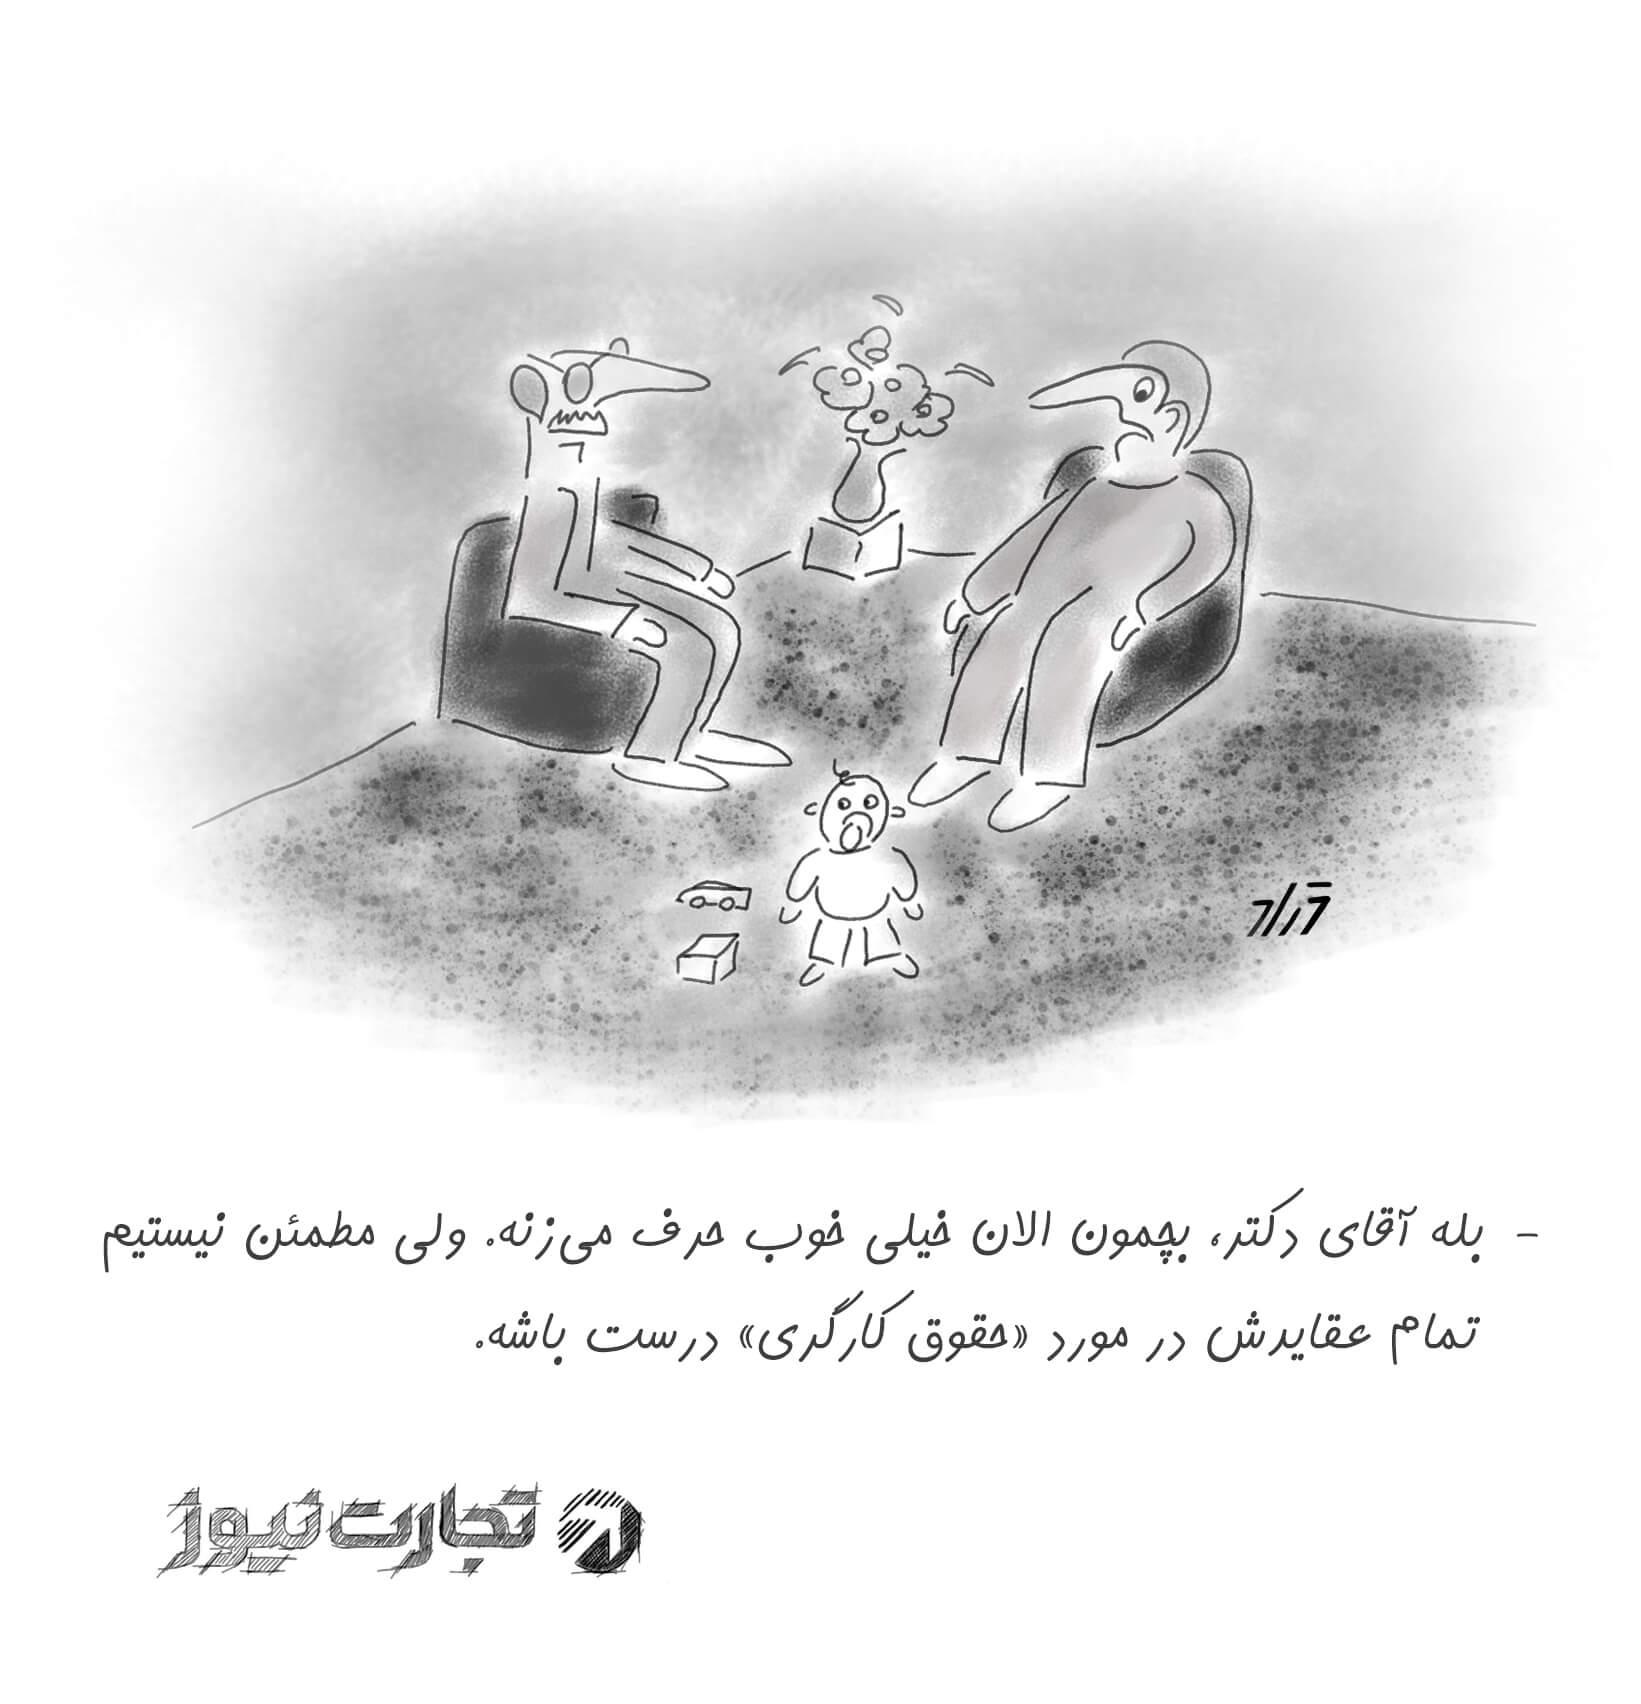 کاریکاتور کارتون تجارتنیوز صحبت بچه گفتاردرمانی دکتر پزشک حقوق کارگری